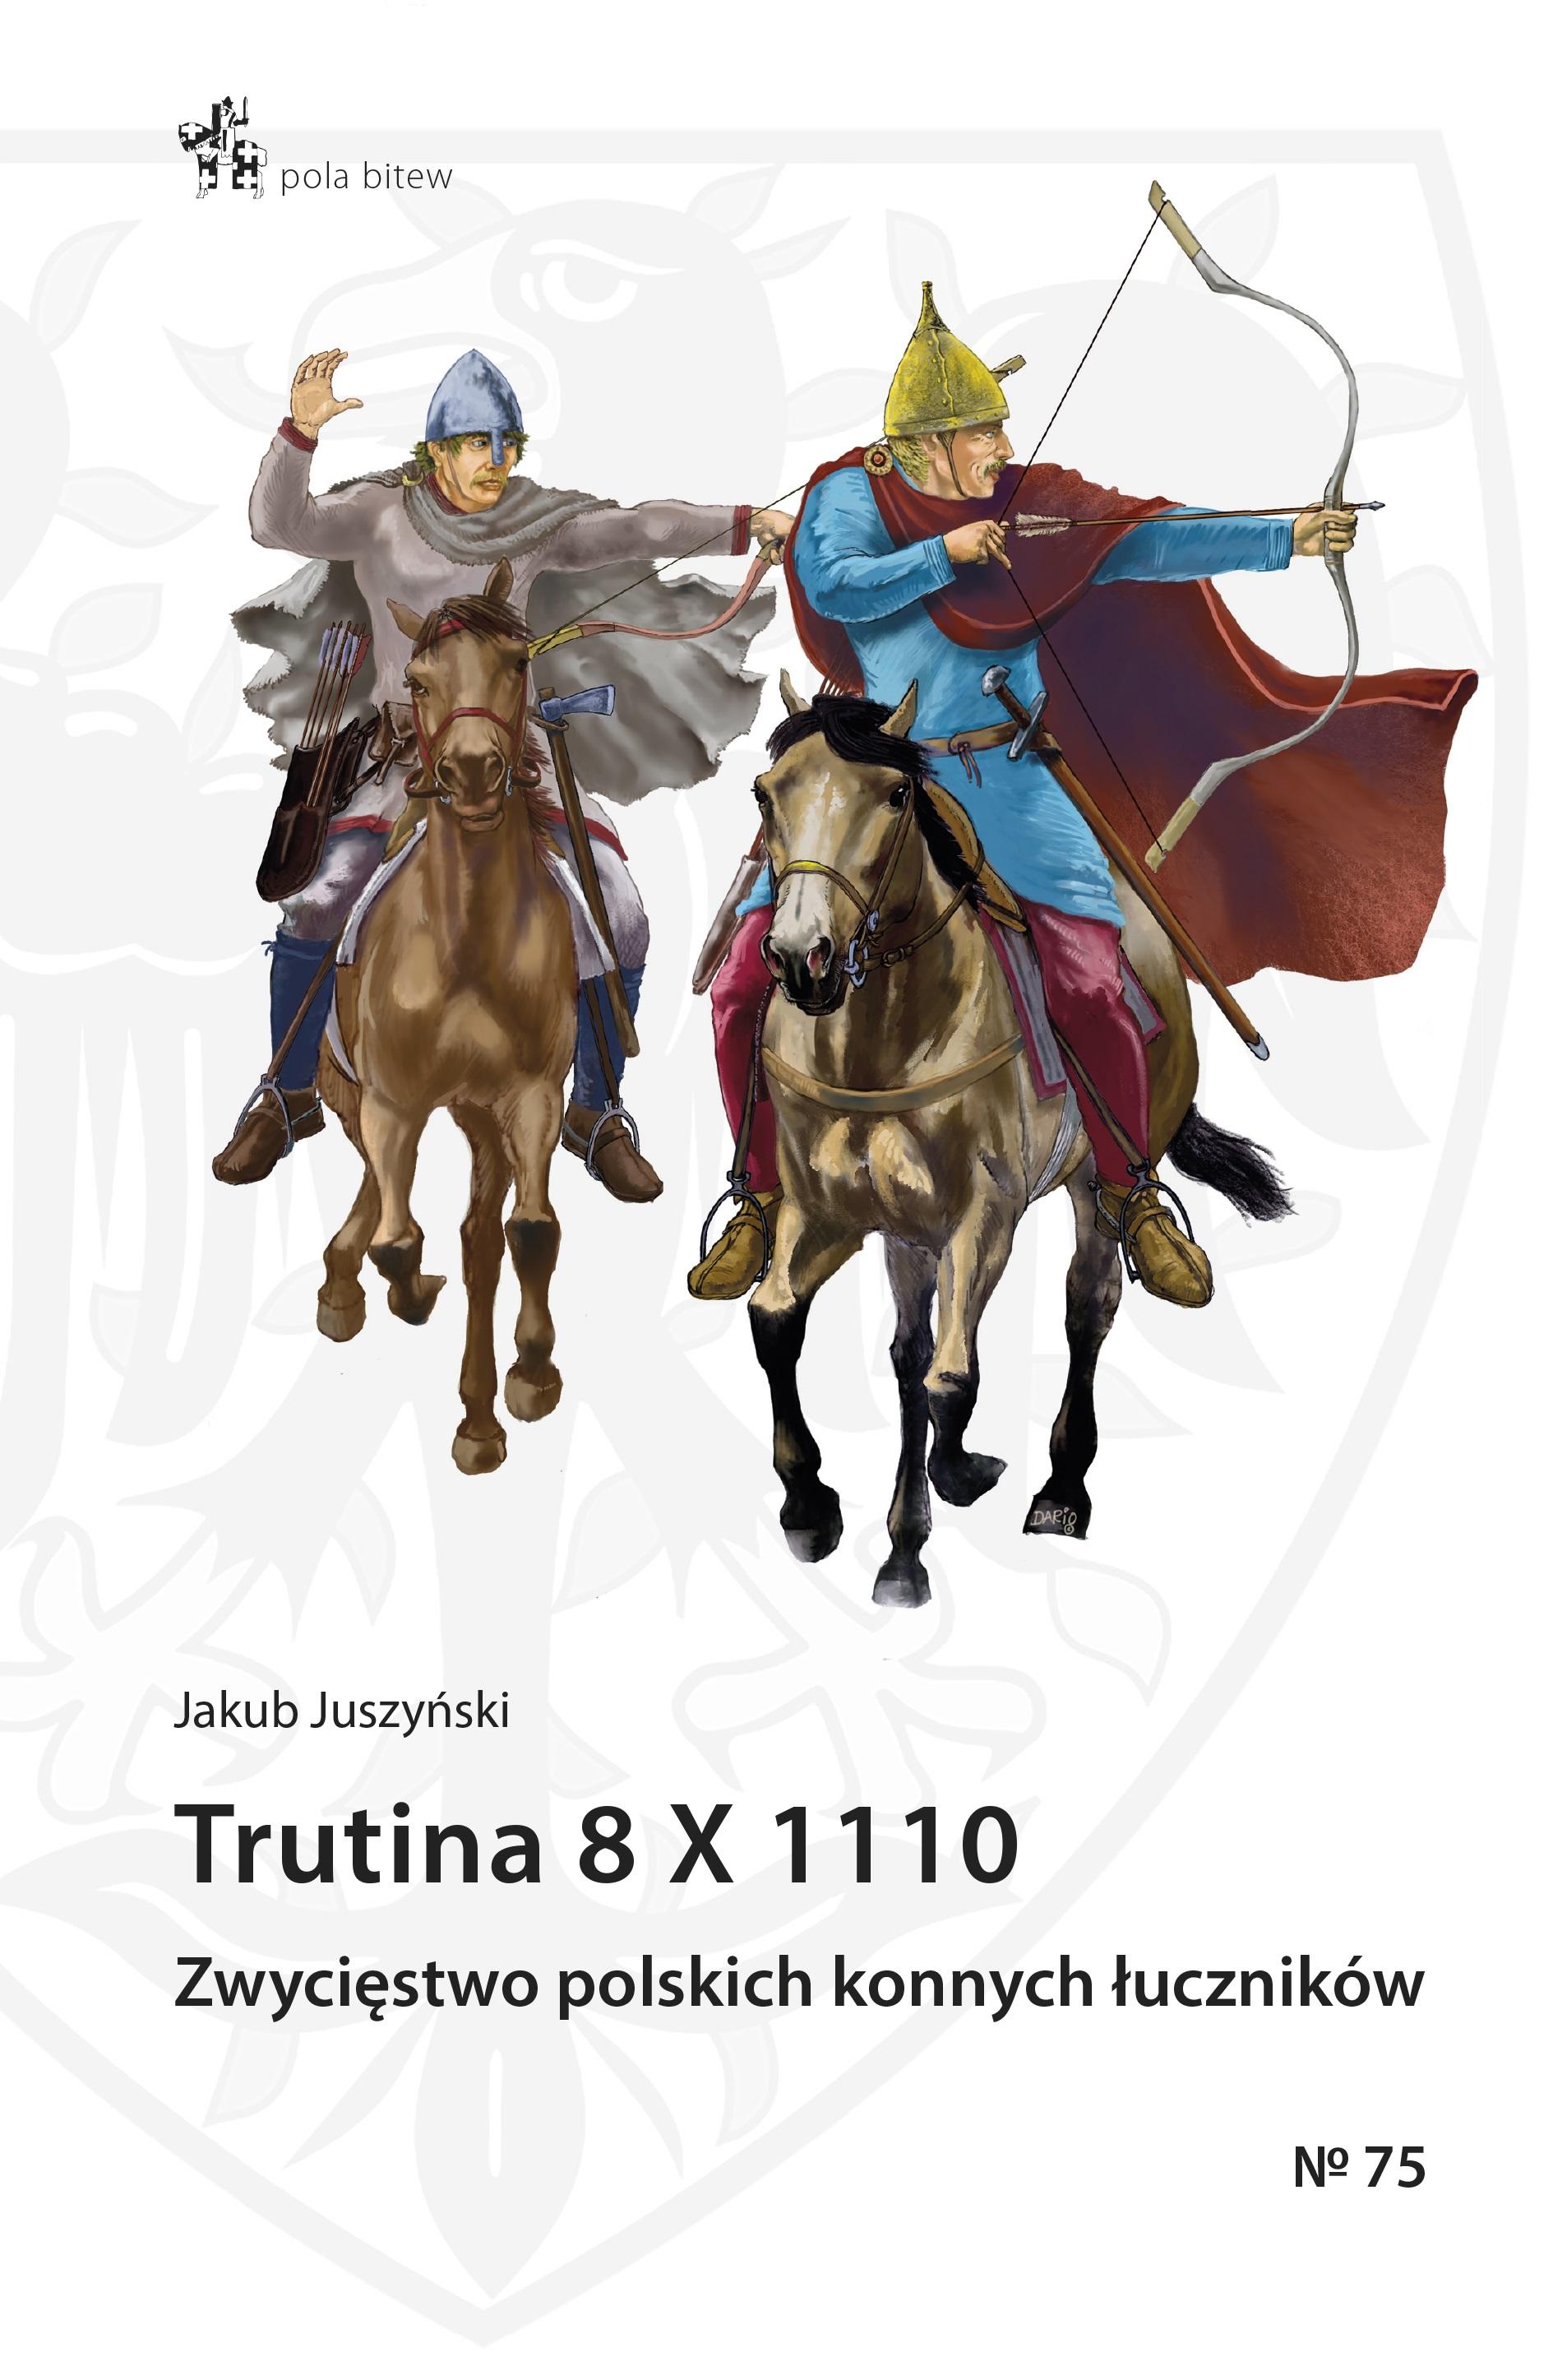 Trutina 8 X 1110